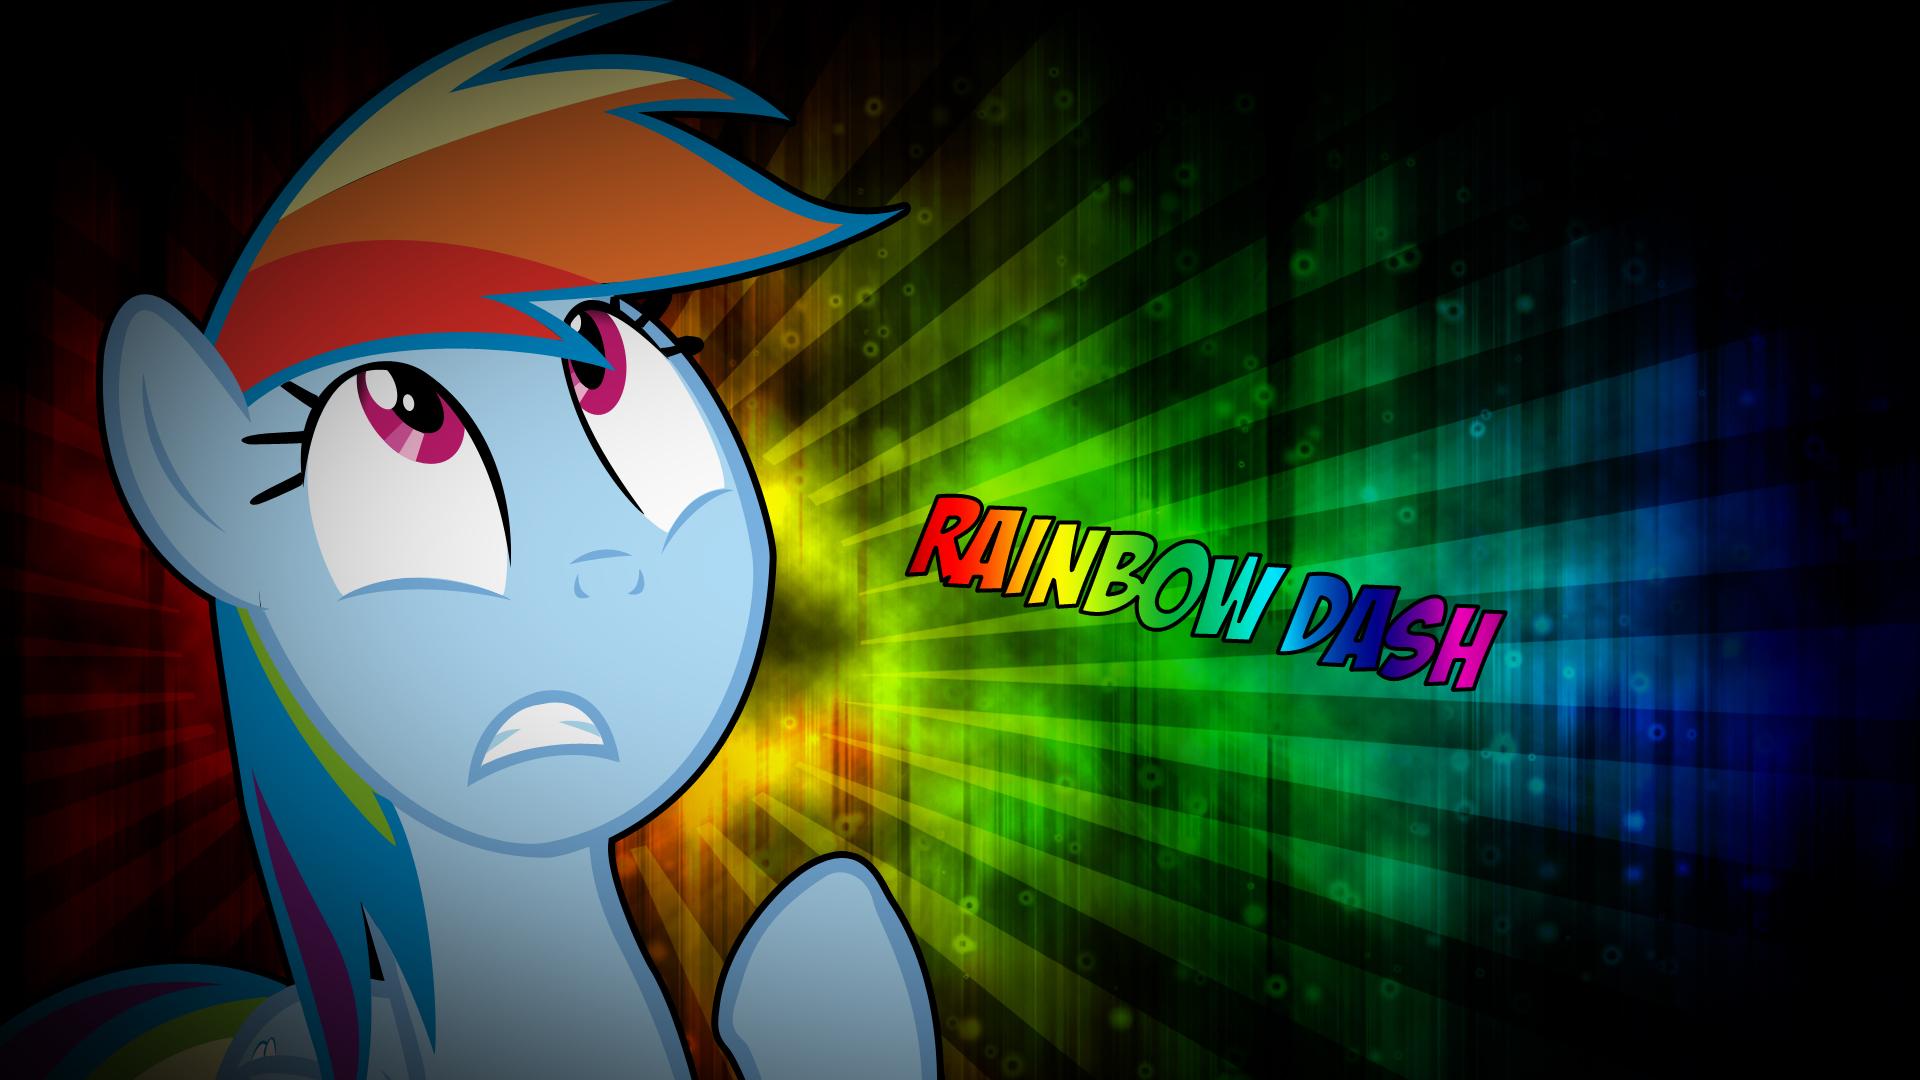 rainbow dash sphere background - photo #21